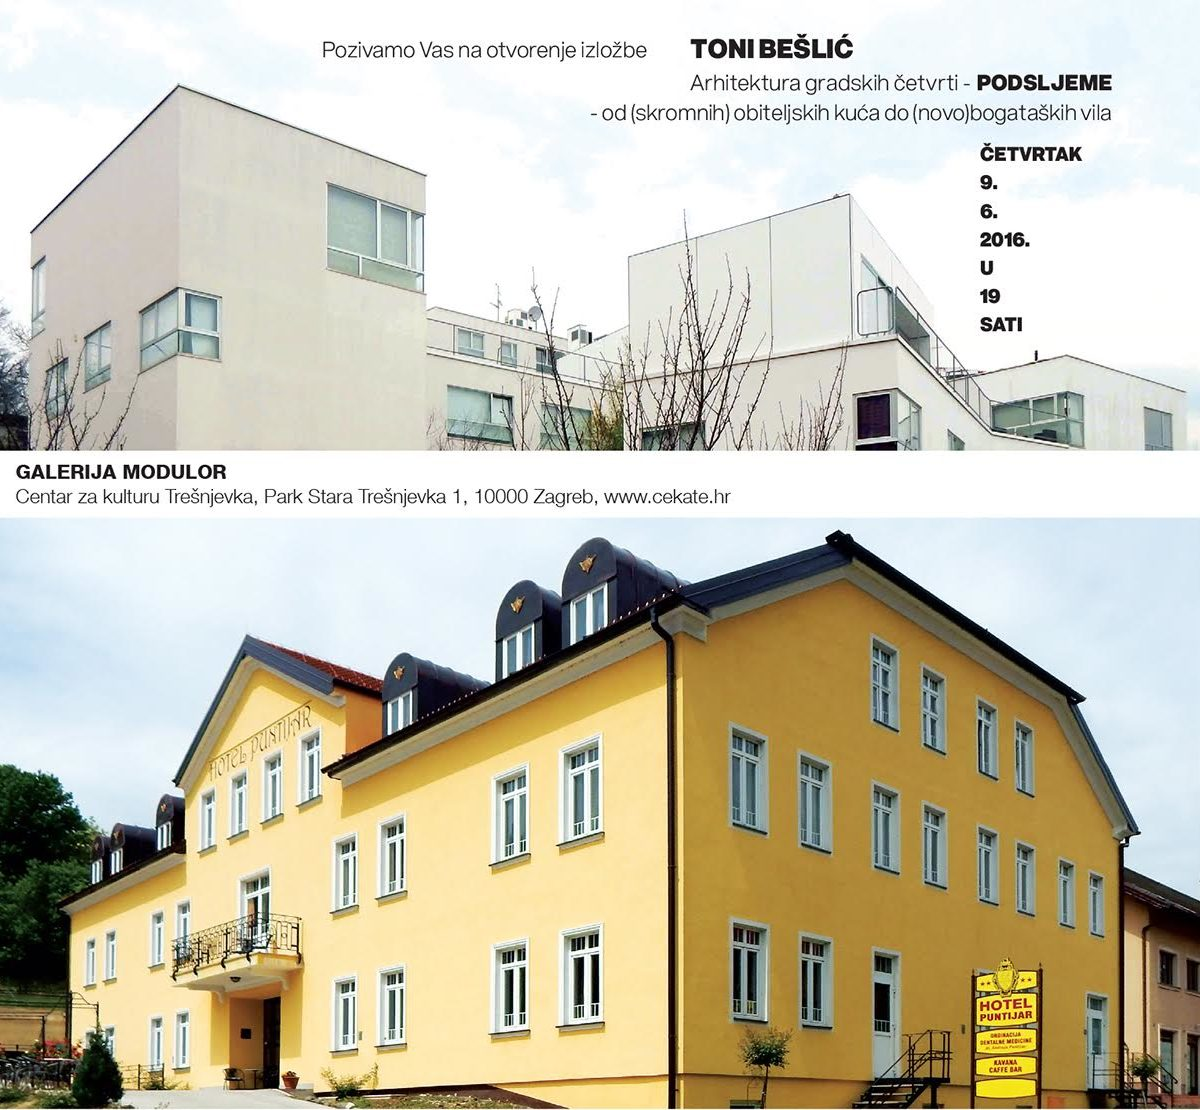 Arhitektura zagrebačkih četvrti/PODSLJEME-od (skromnih) obiteljskih kuća do (novo)bogataških vila